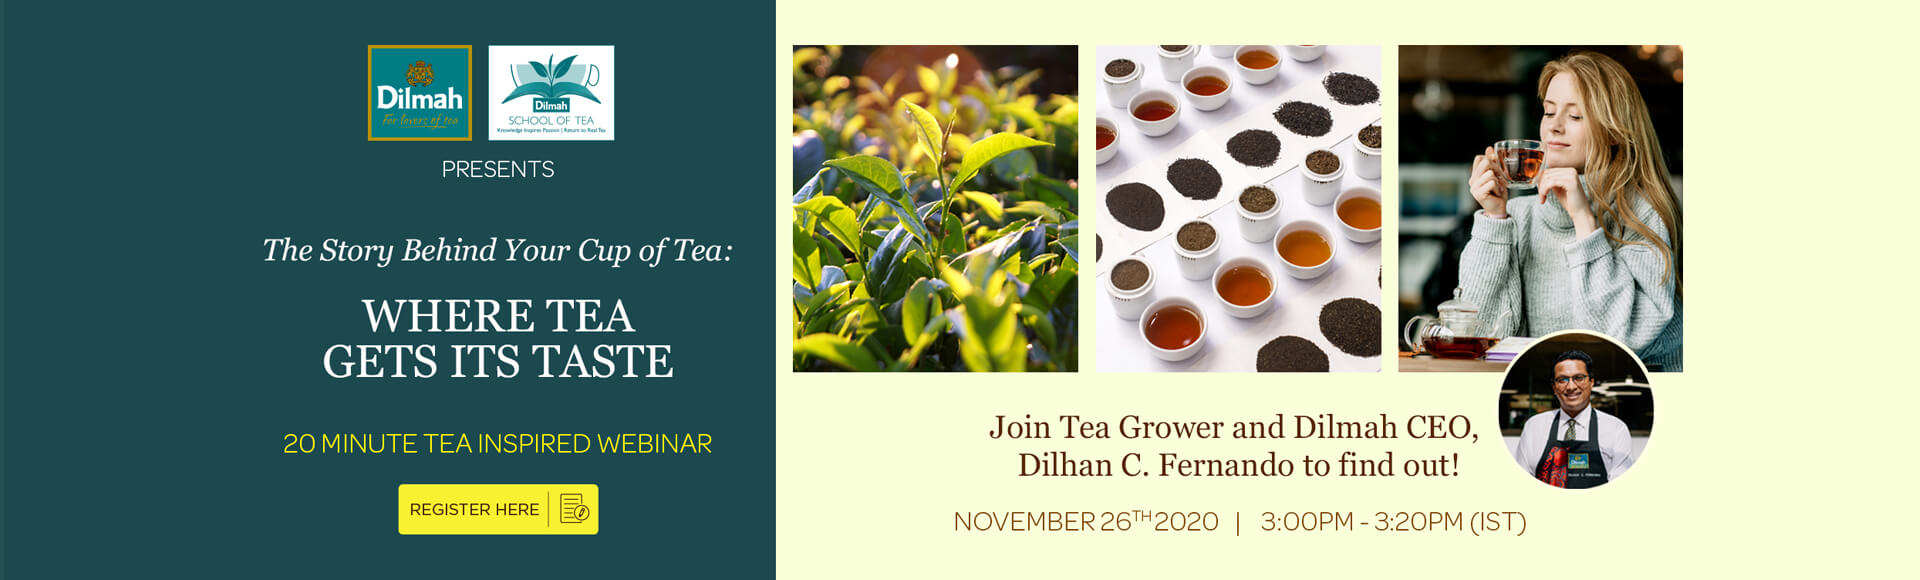 Tea Inspired Webinar